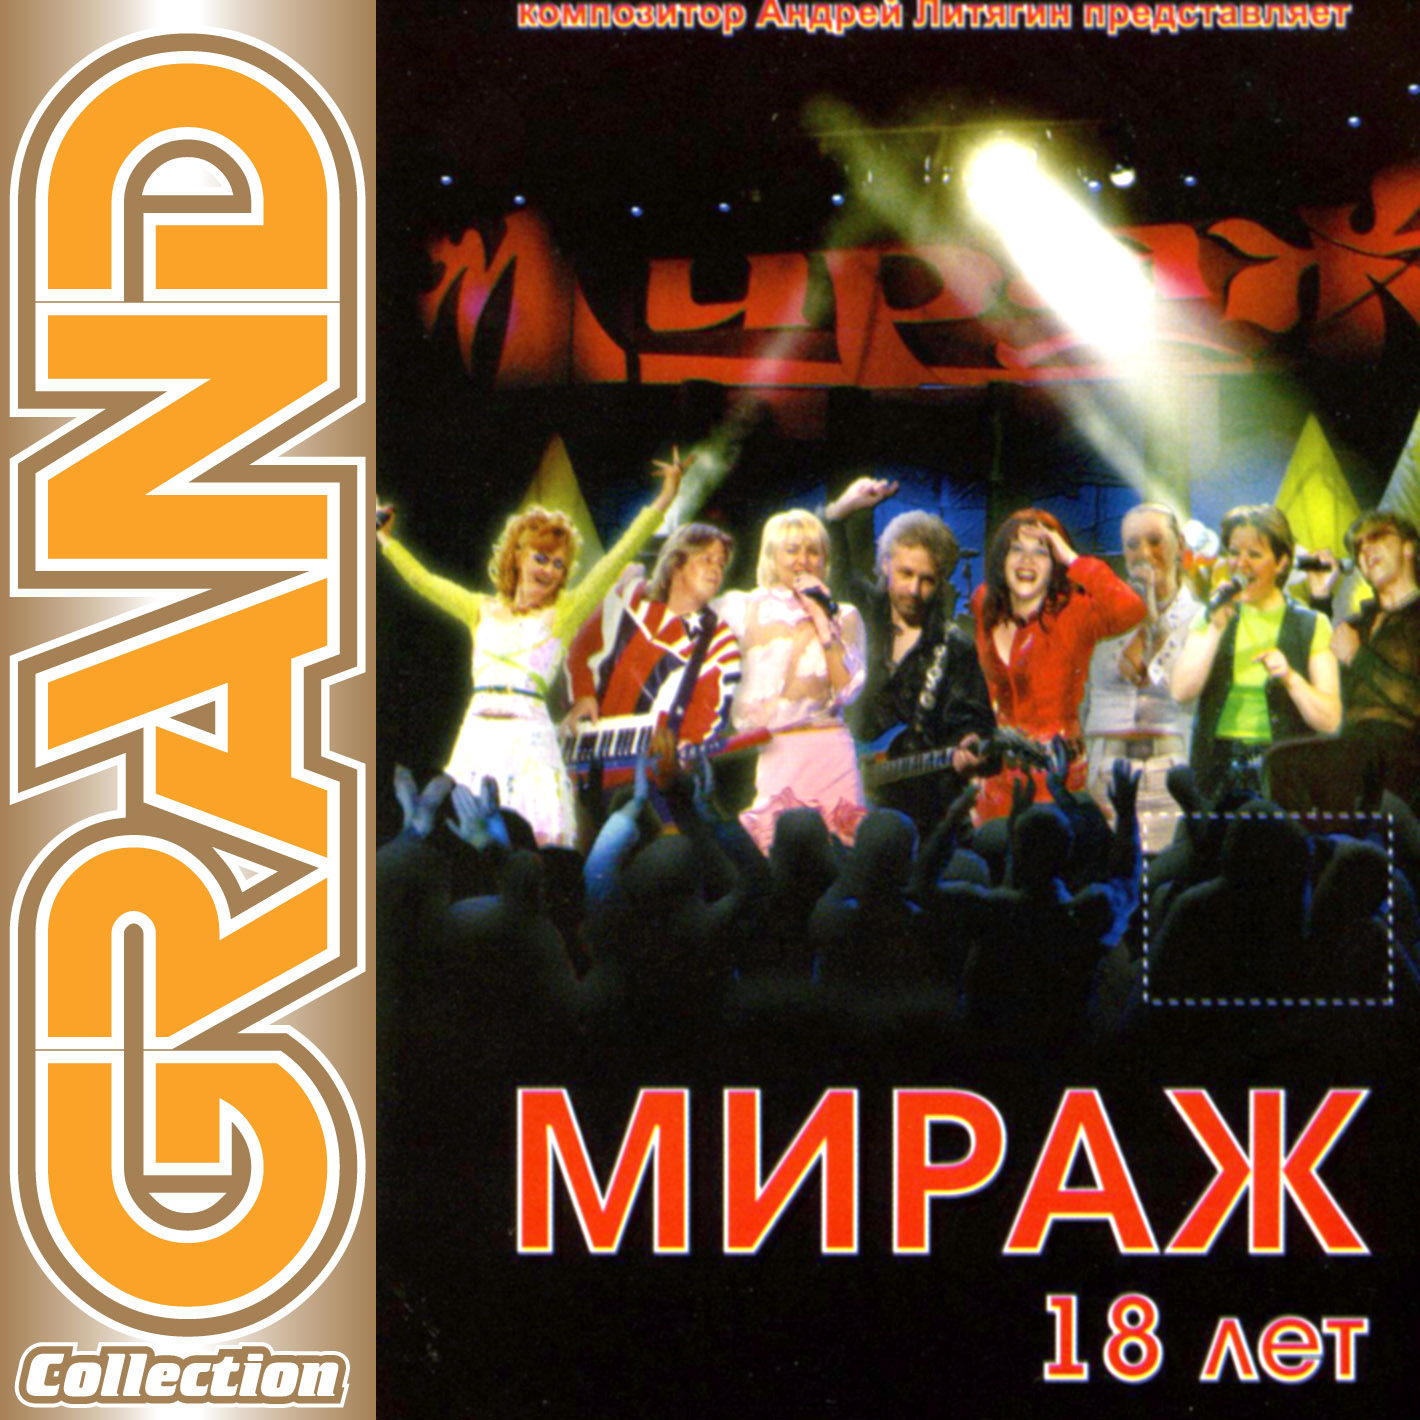 «Мираж 18 лет» CD серии «Гранд коллекшн»